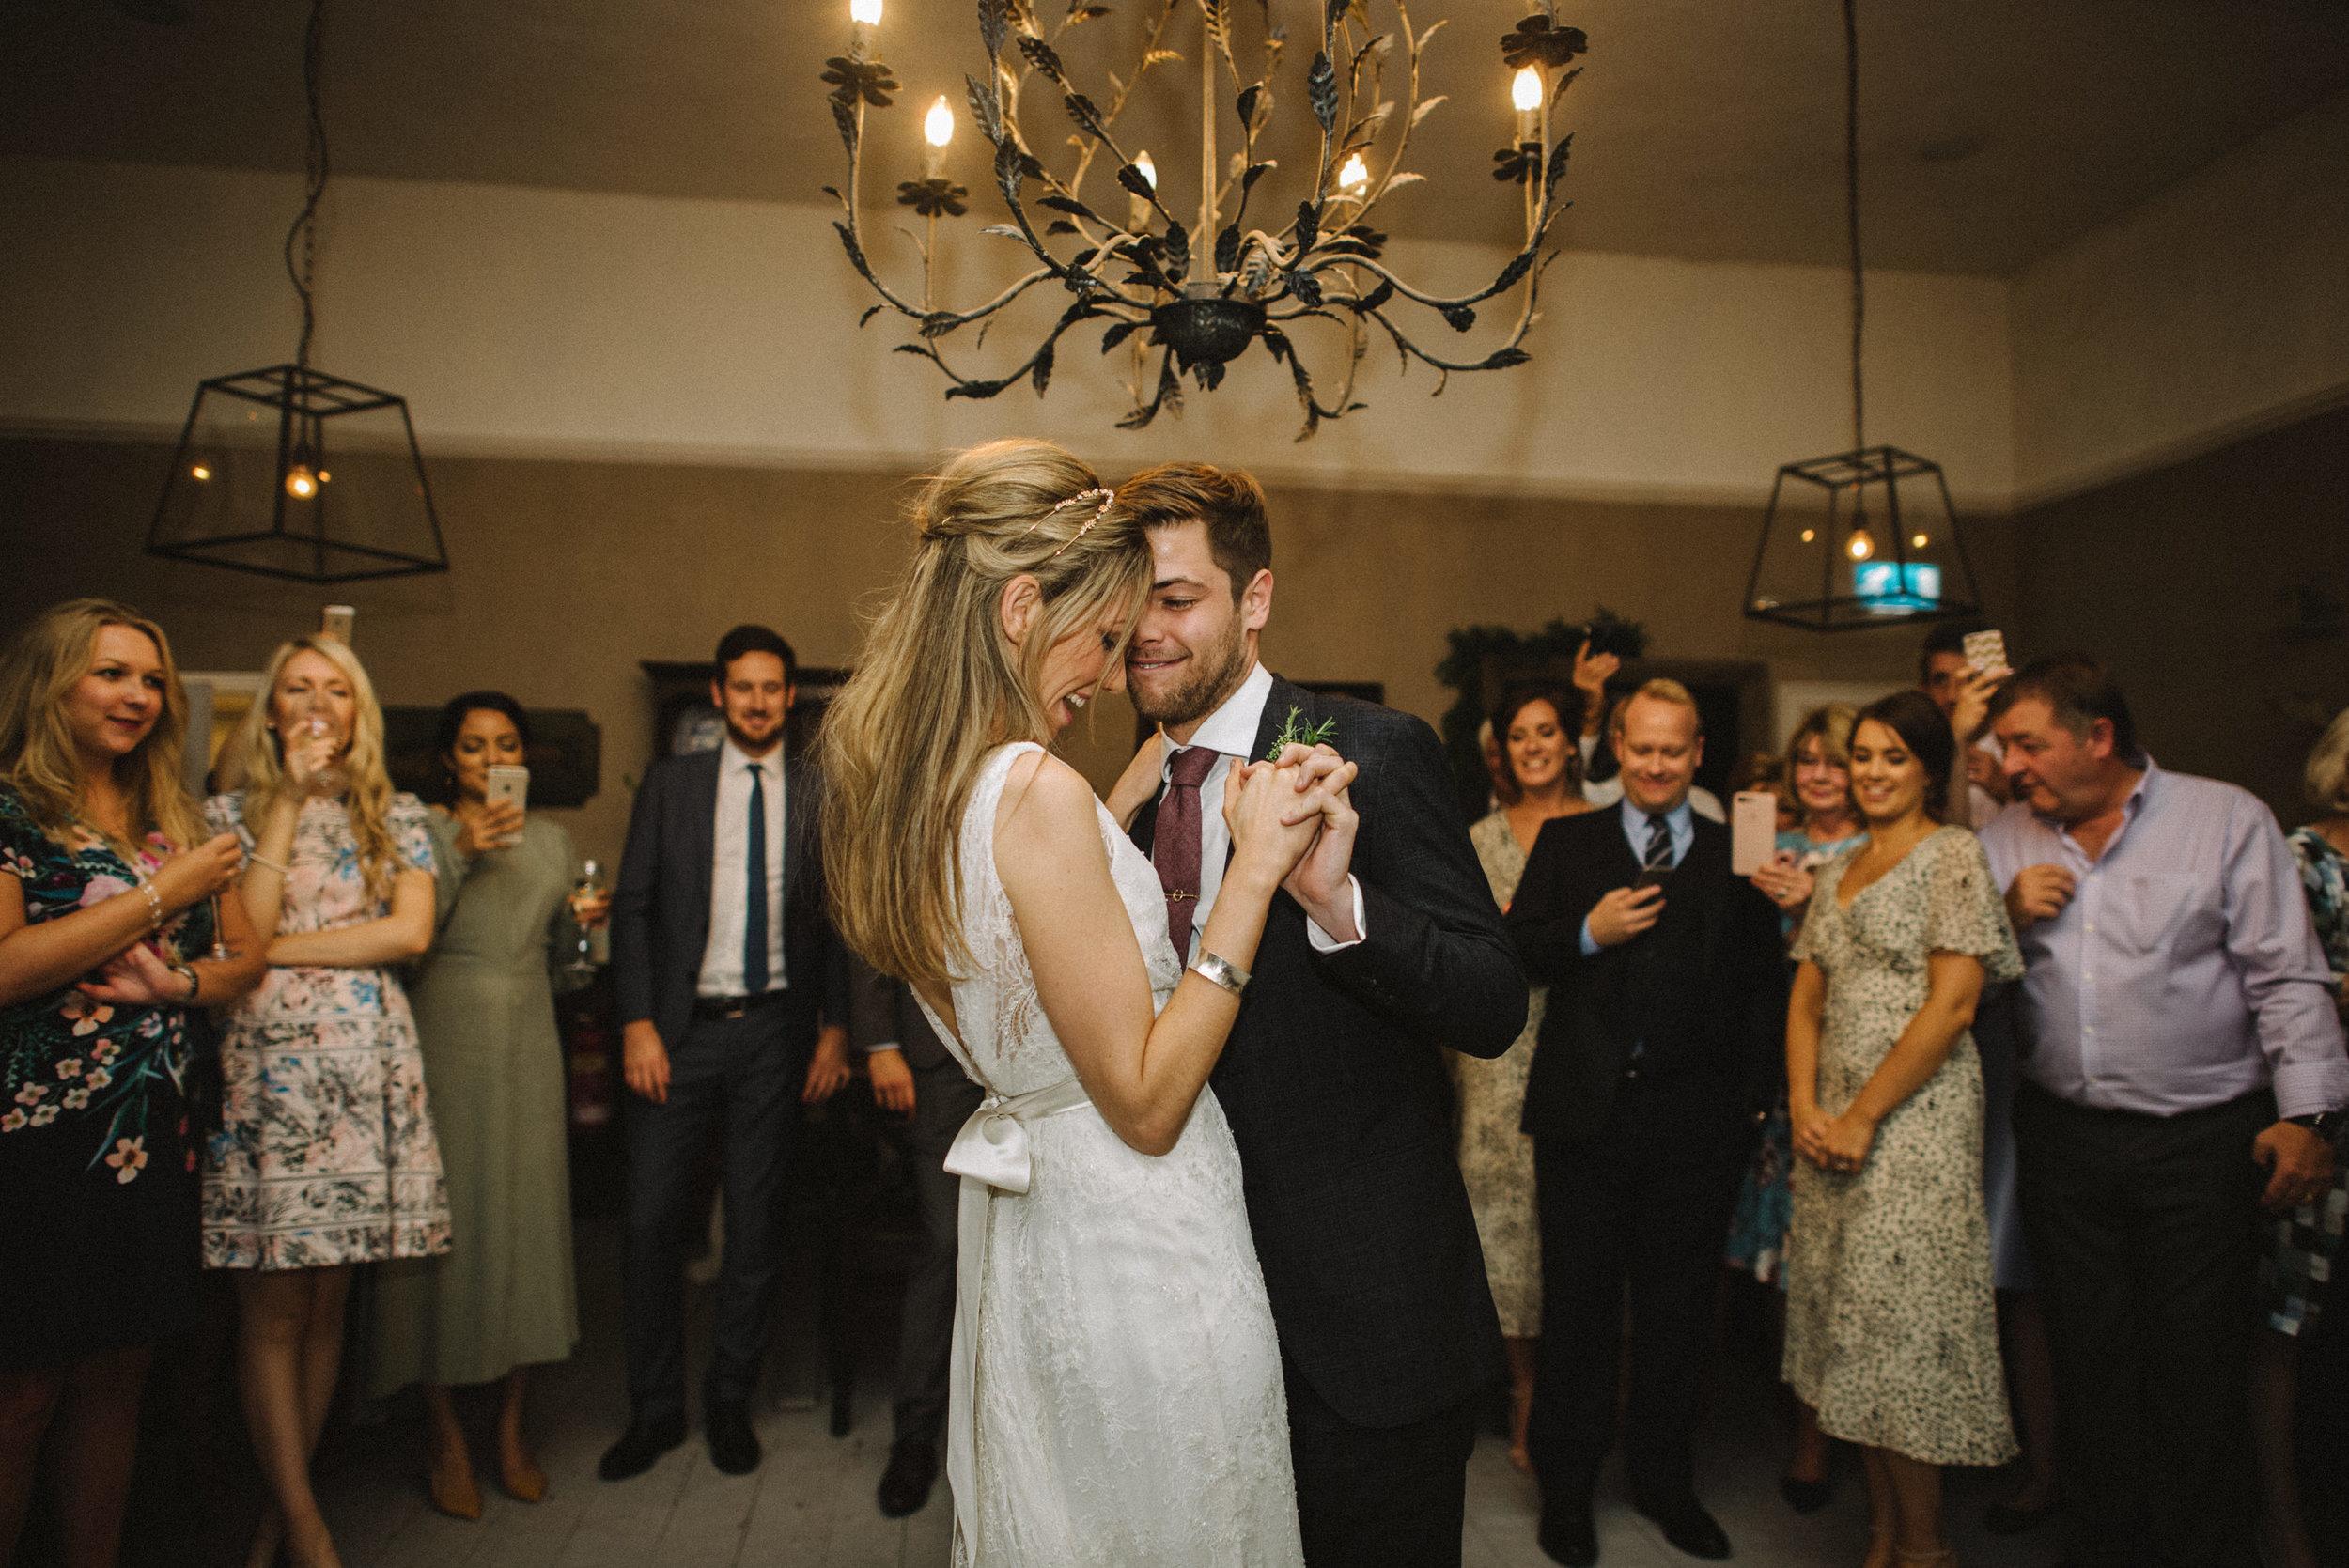 0140-LISA-DEVINE-PHOTOGRAPHY-ALTERNATIVE-WEDDING-PHOTOGRAPHY-SCOTLAND-DESTINATION-WEDDINGS-GLASGOW-WEDDINGS-COOL-WEDDINGS-STYLISH-WEDDINGS.JPG